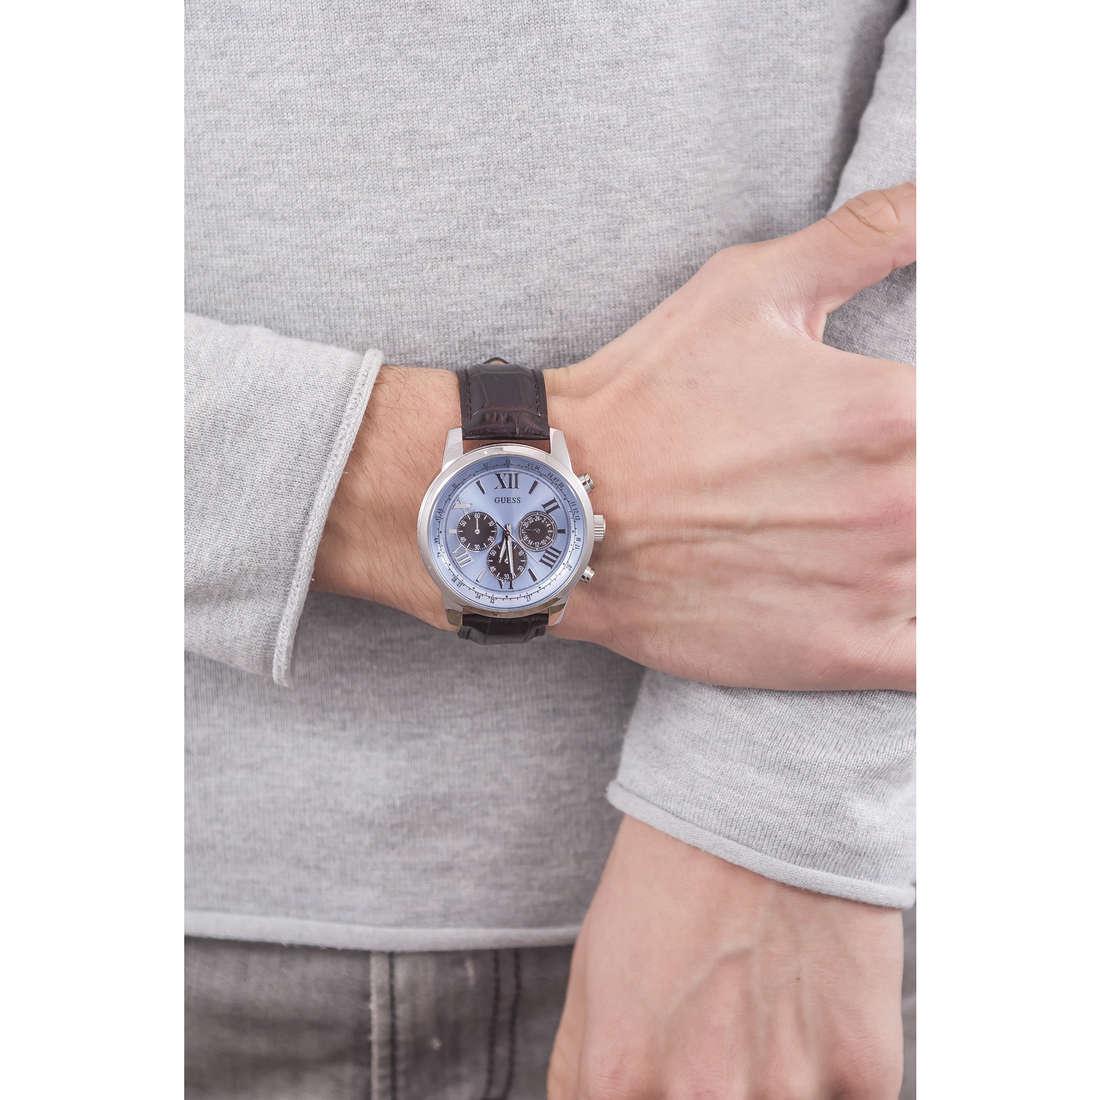 Guess cronografi Ice Blue uomo W0380G6 indosso